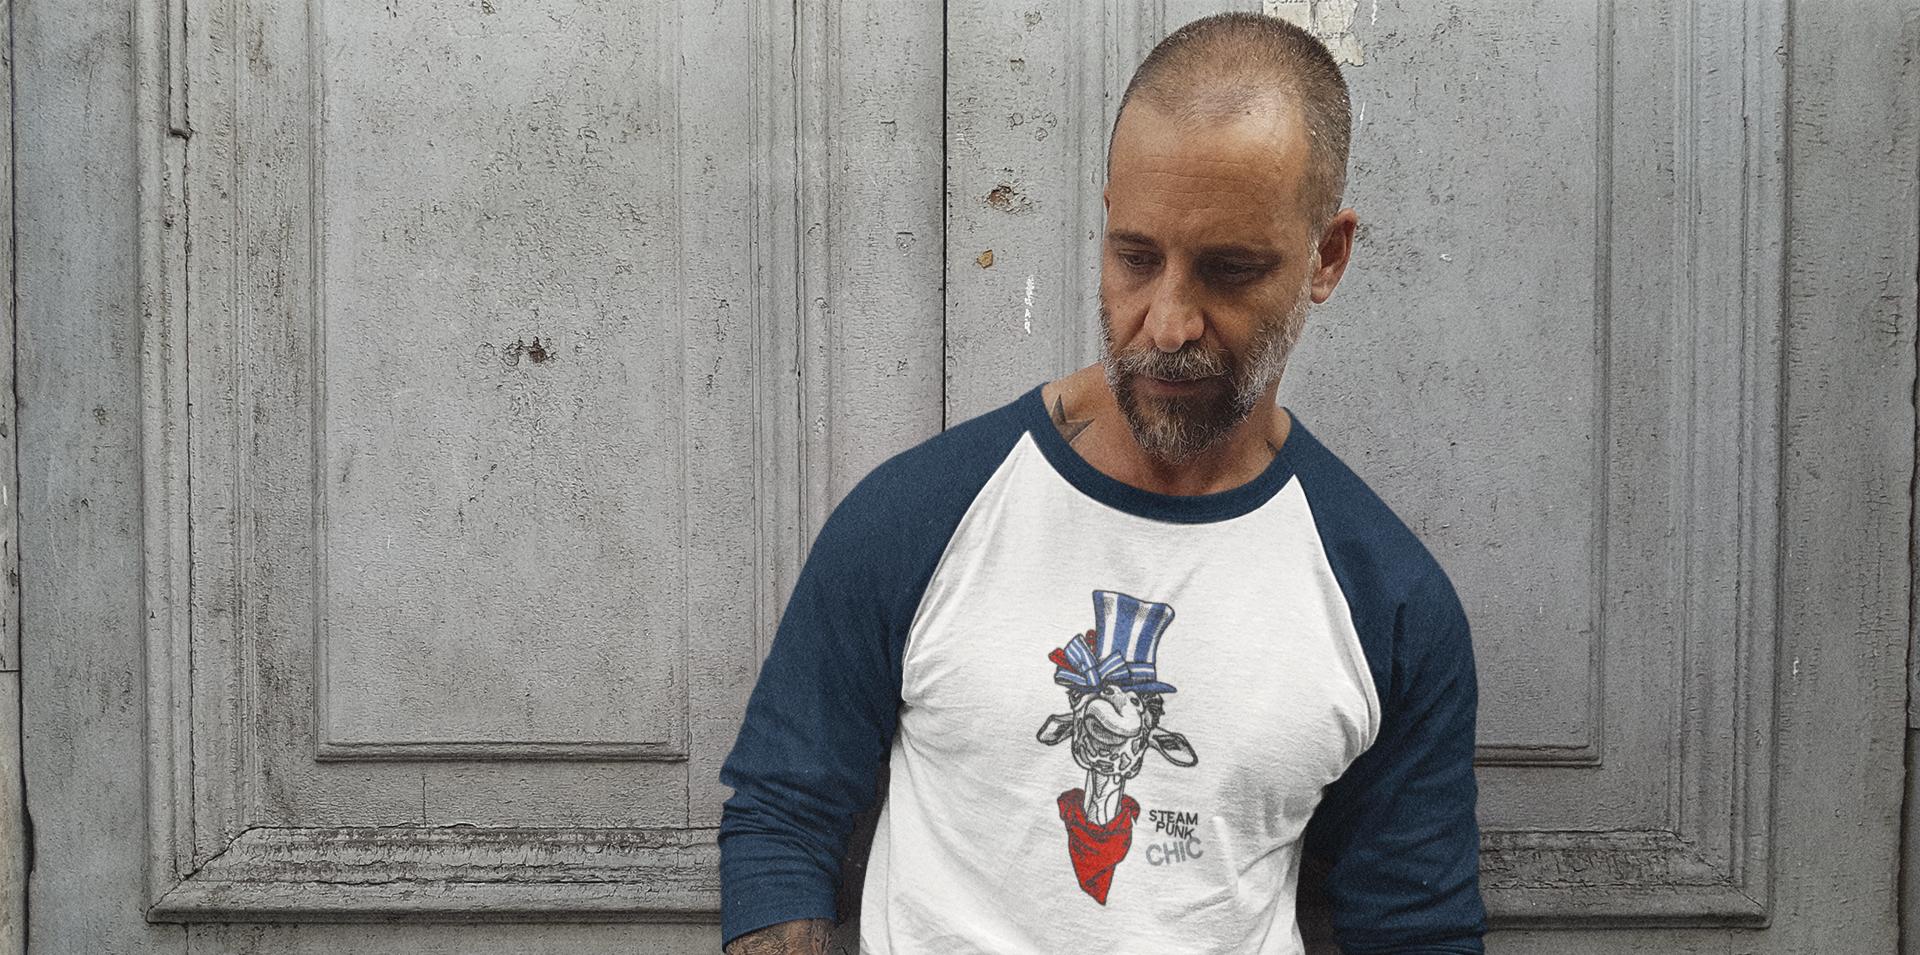 raglan-t-shirt-mockup-of-a-middle-aged-g